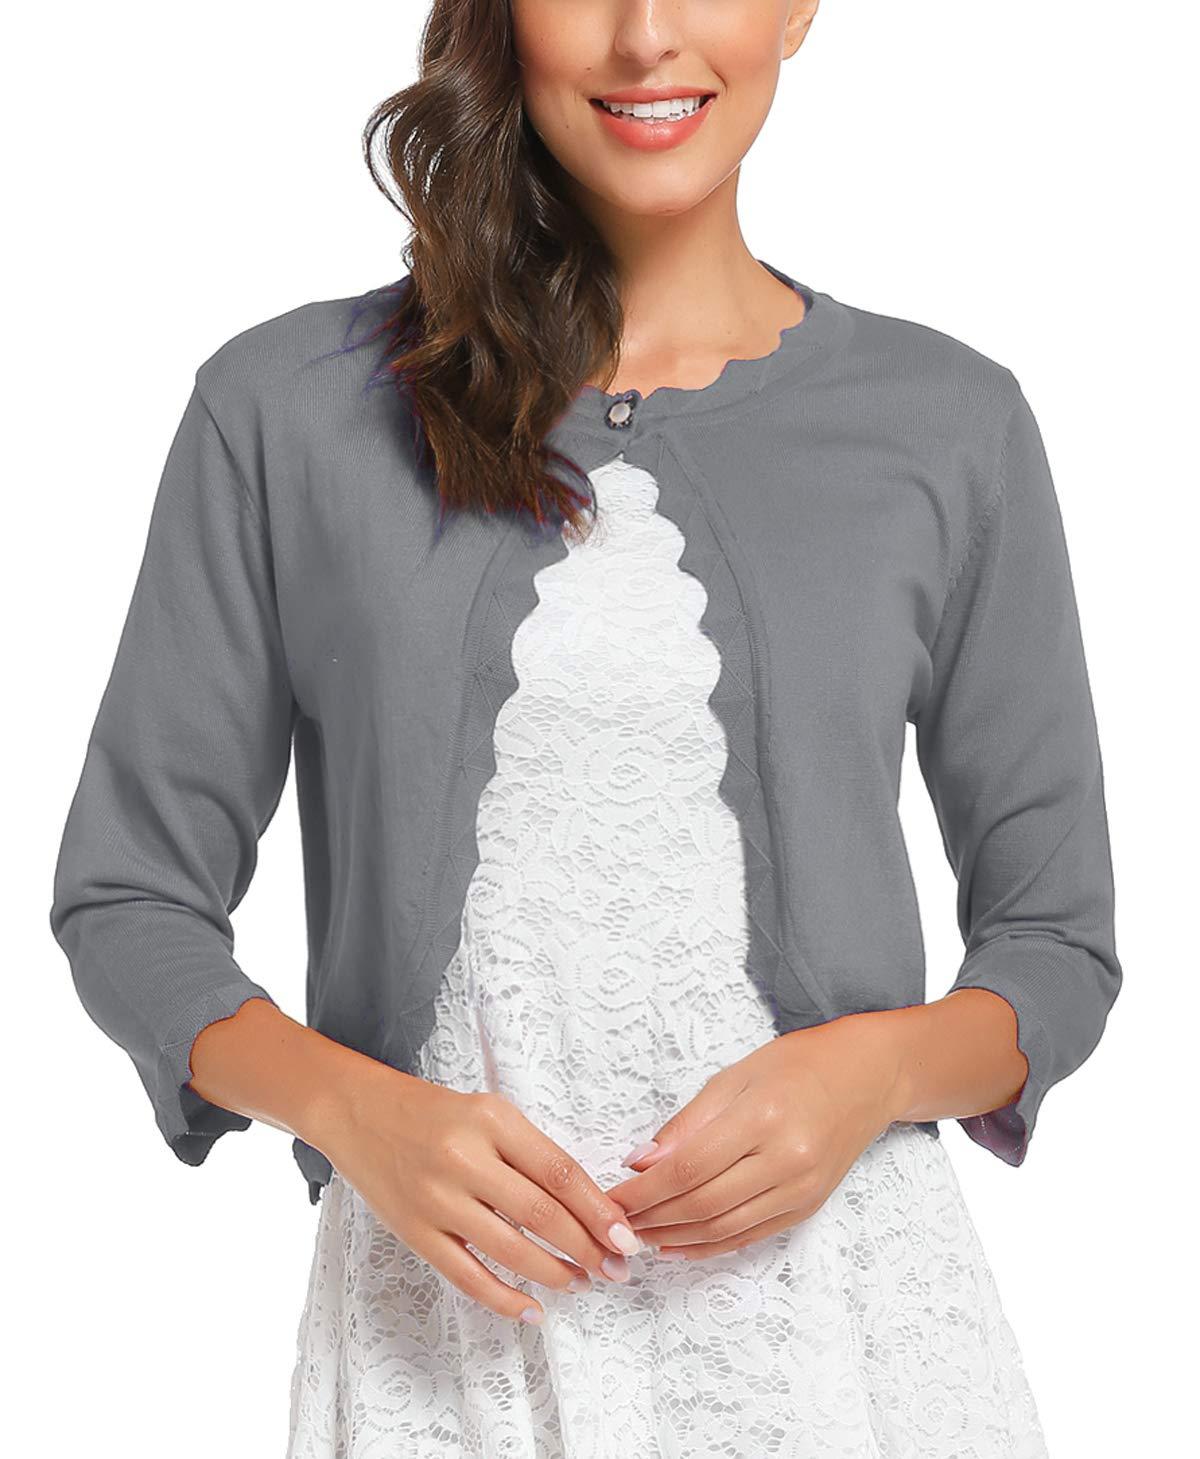 iClosam Women 3/4 Sleeves Cardigan Sweater Knit Bolero Shrug (Grey, X-Large)